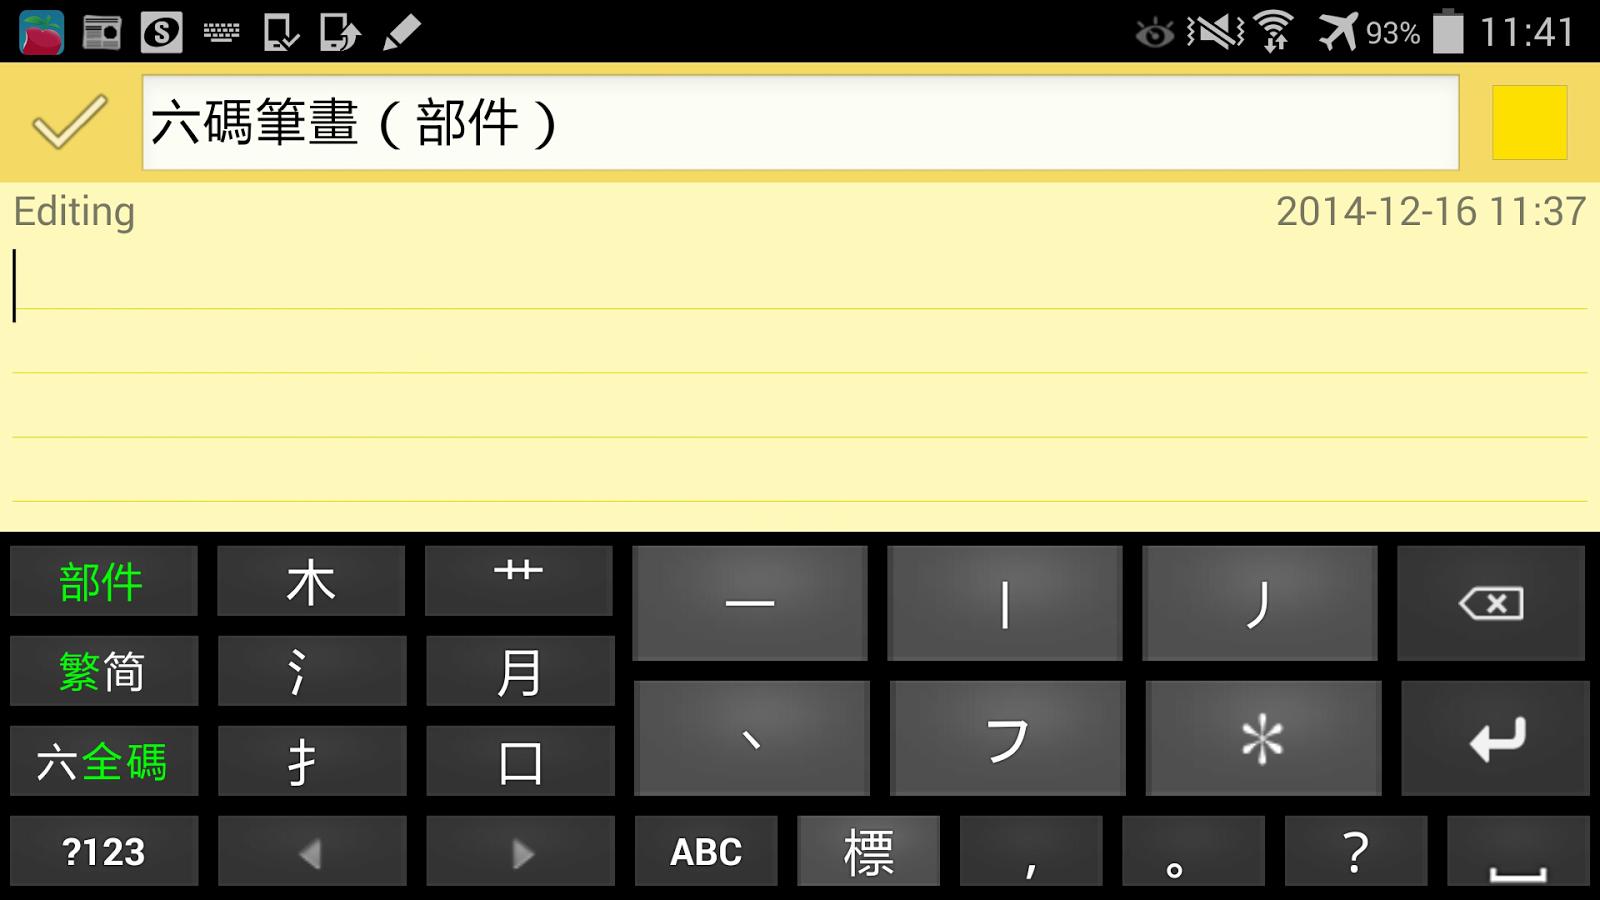 六碼筆畫 - screenshot